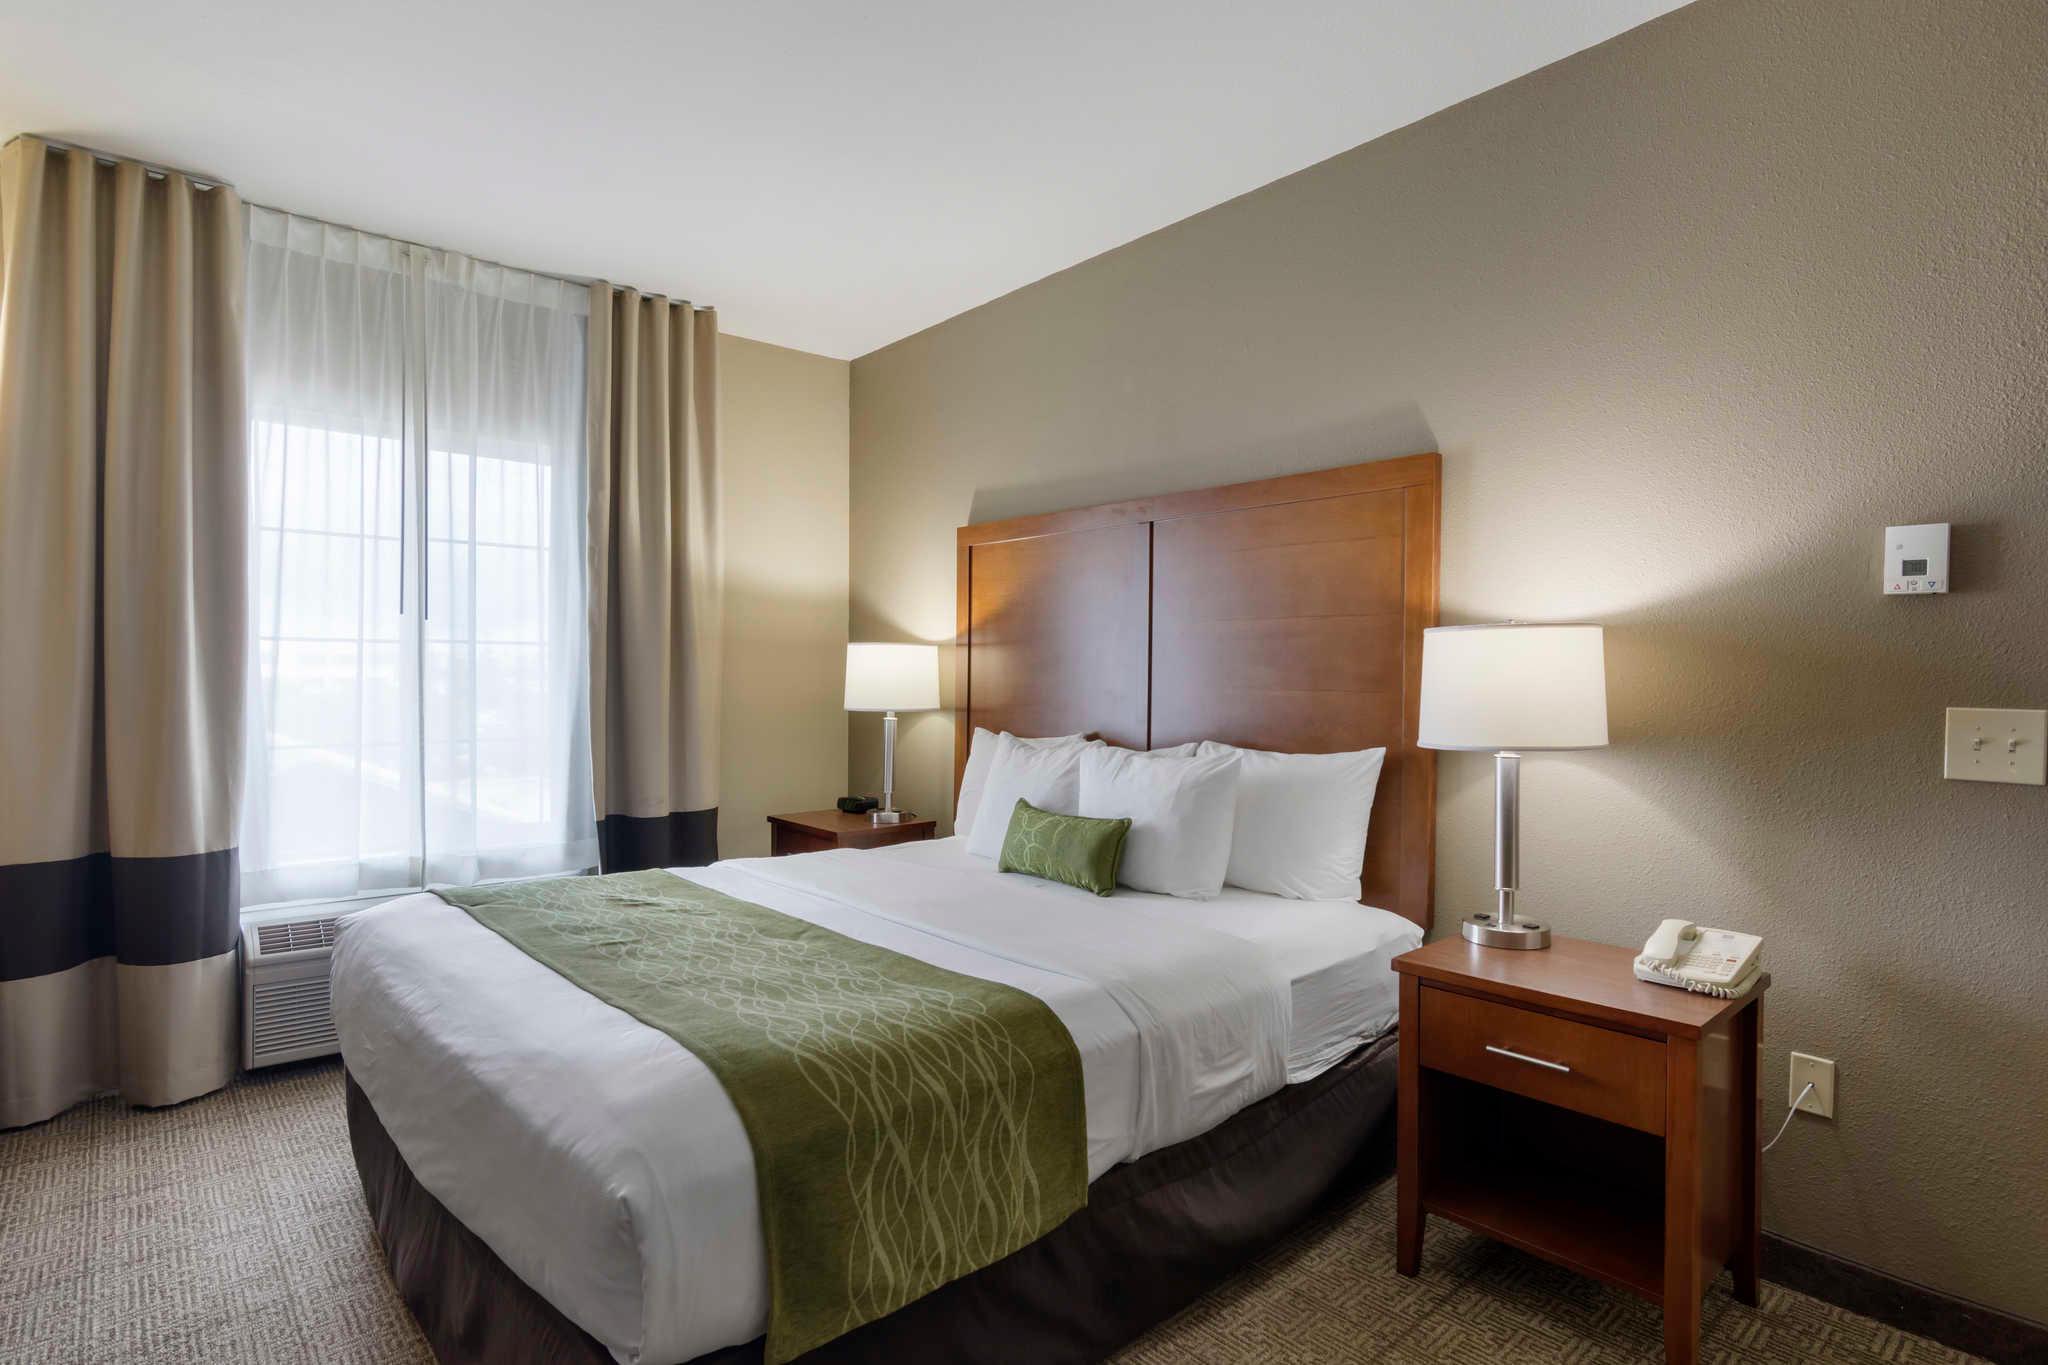 Comfort Inn & Suites Sacramento - University Area image 23